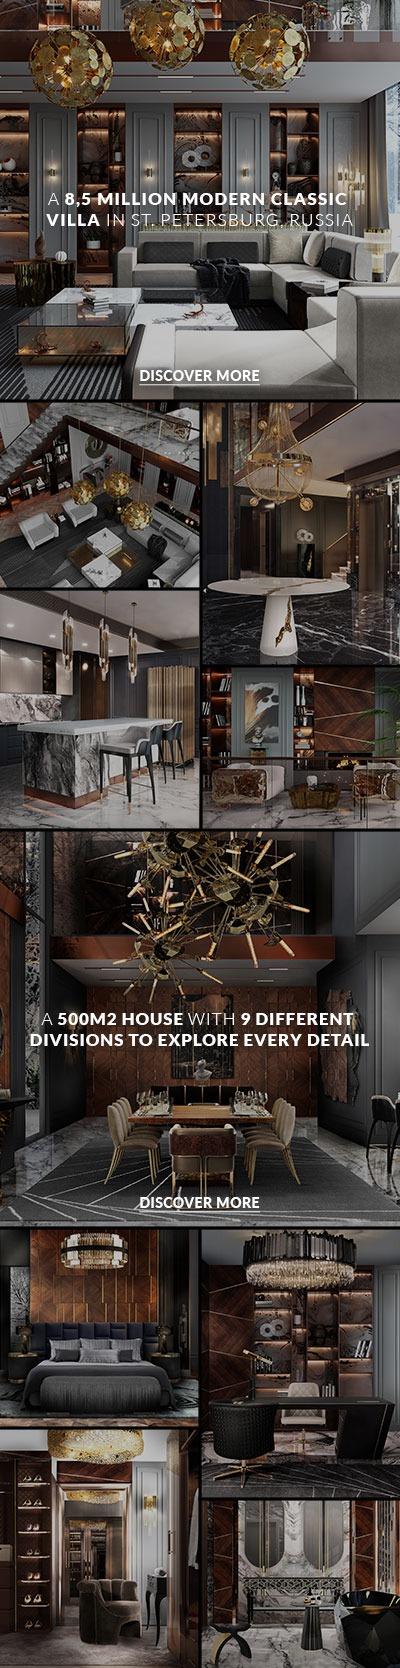 Dining Room Ideas sidebannermoodboardCHourhouses